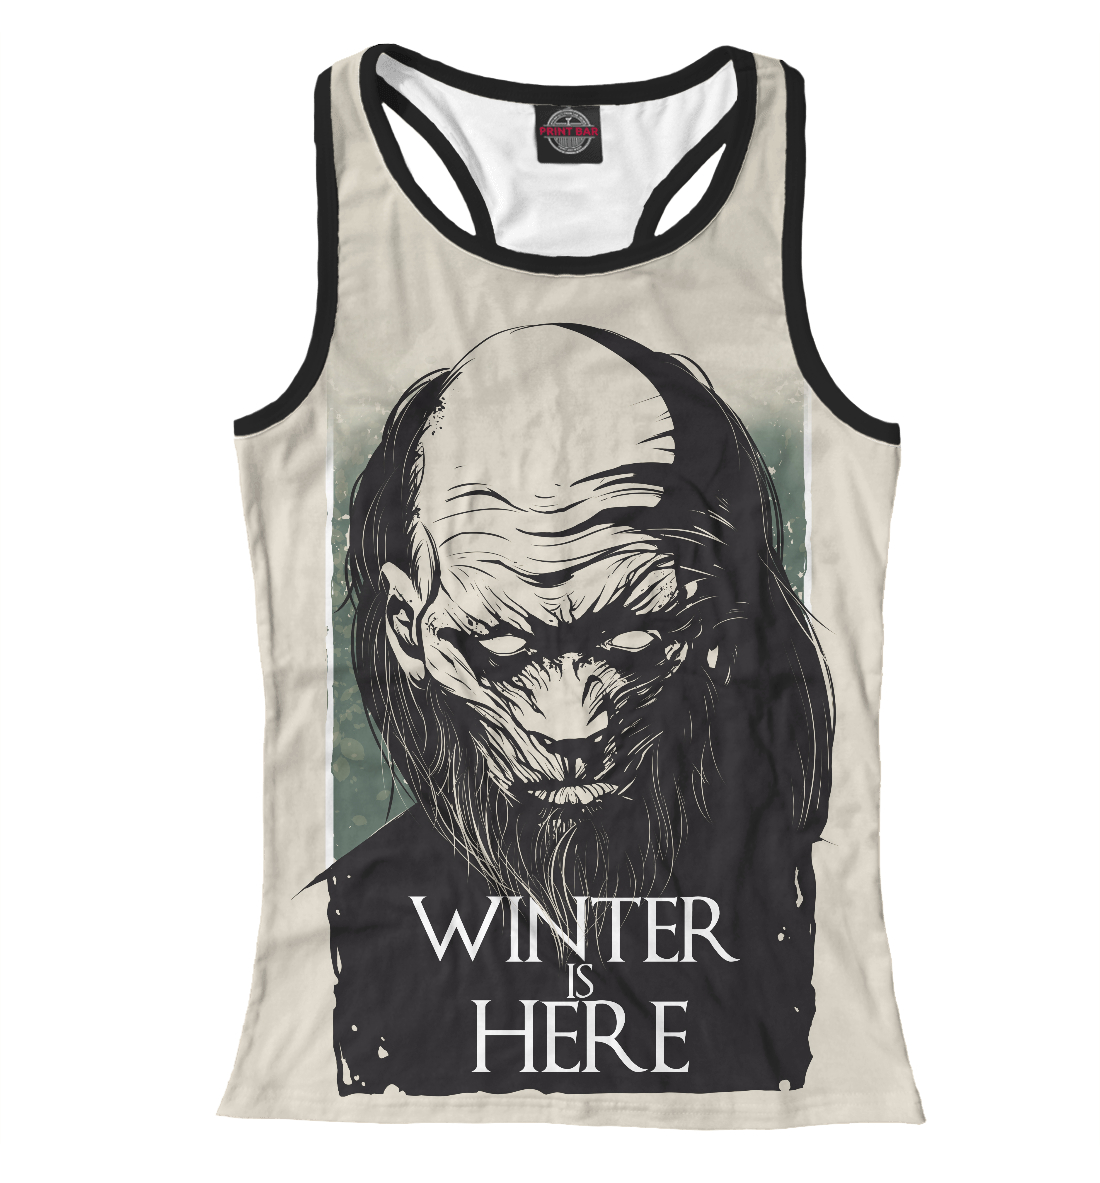 Winter Is Here, Printbar, Майки борцовки, IGR-507702-mayb-1  - купить со скидкой